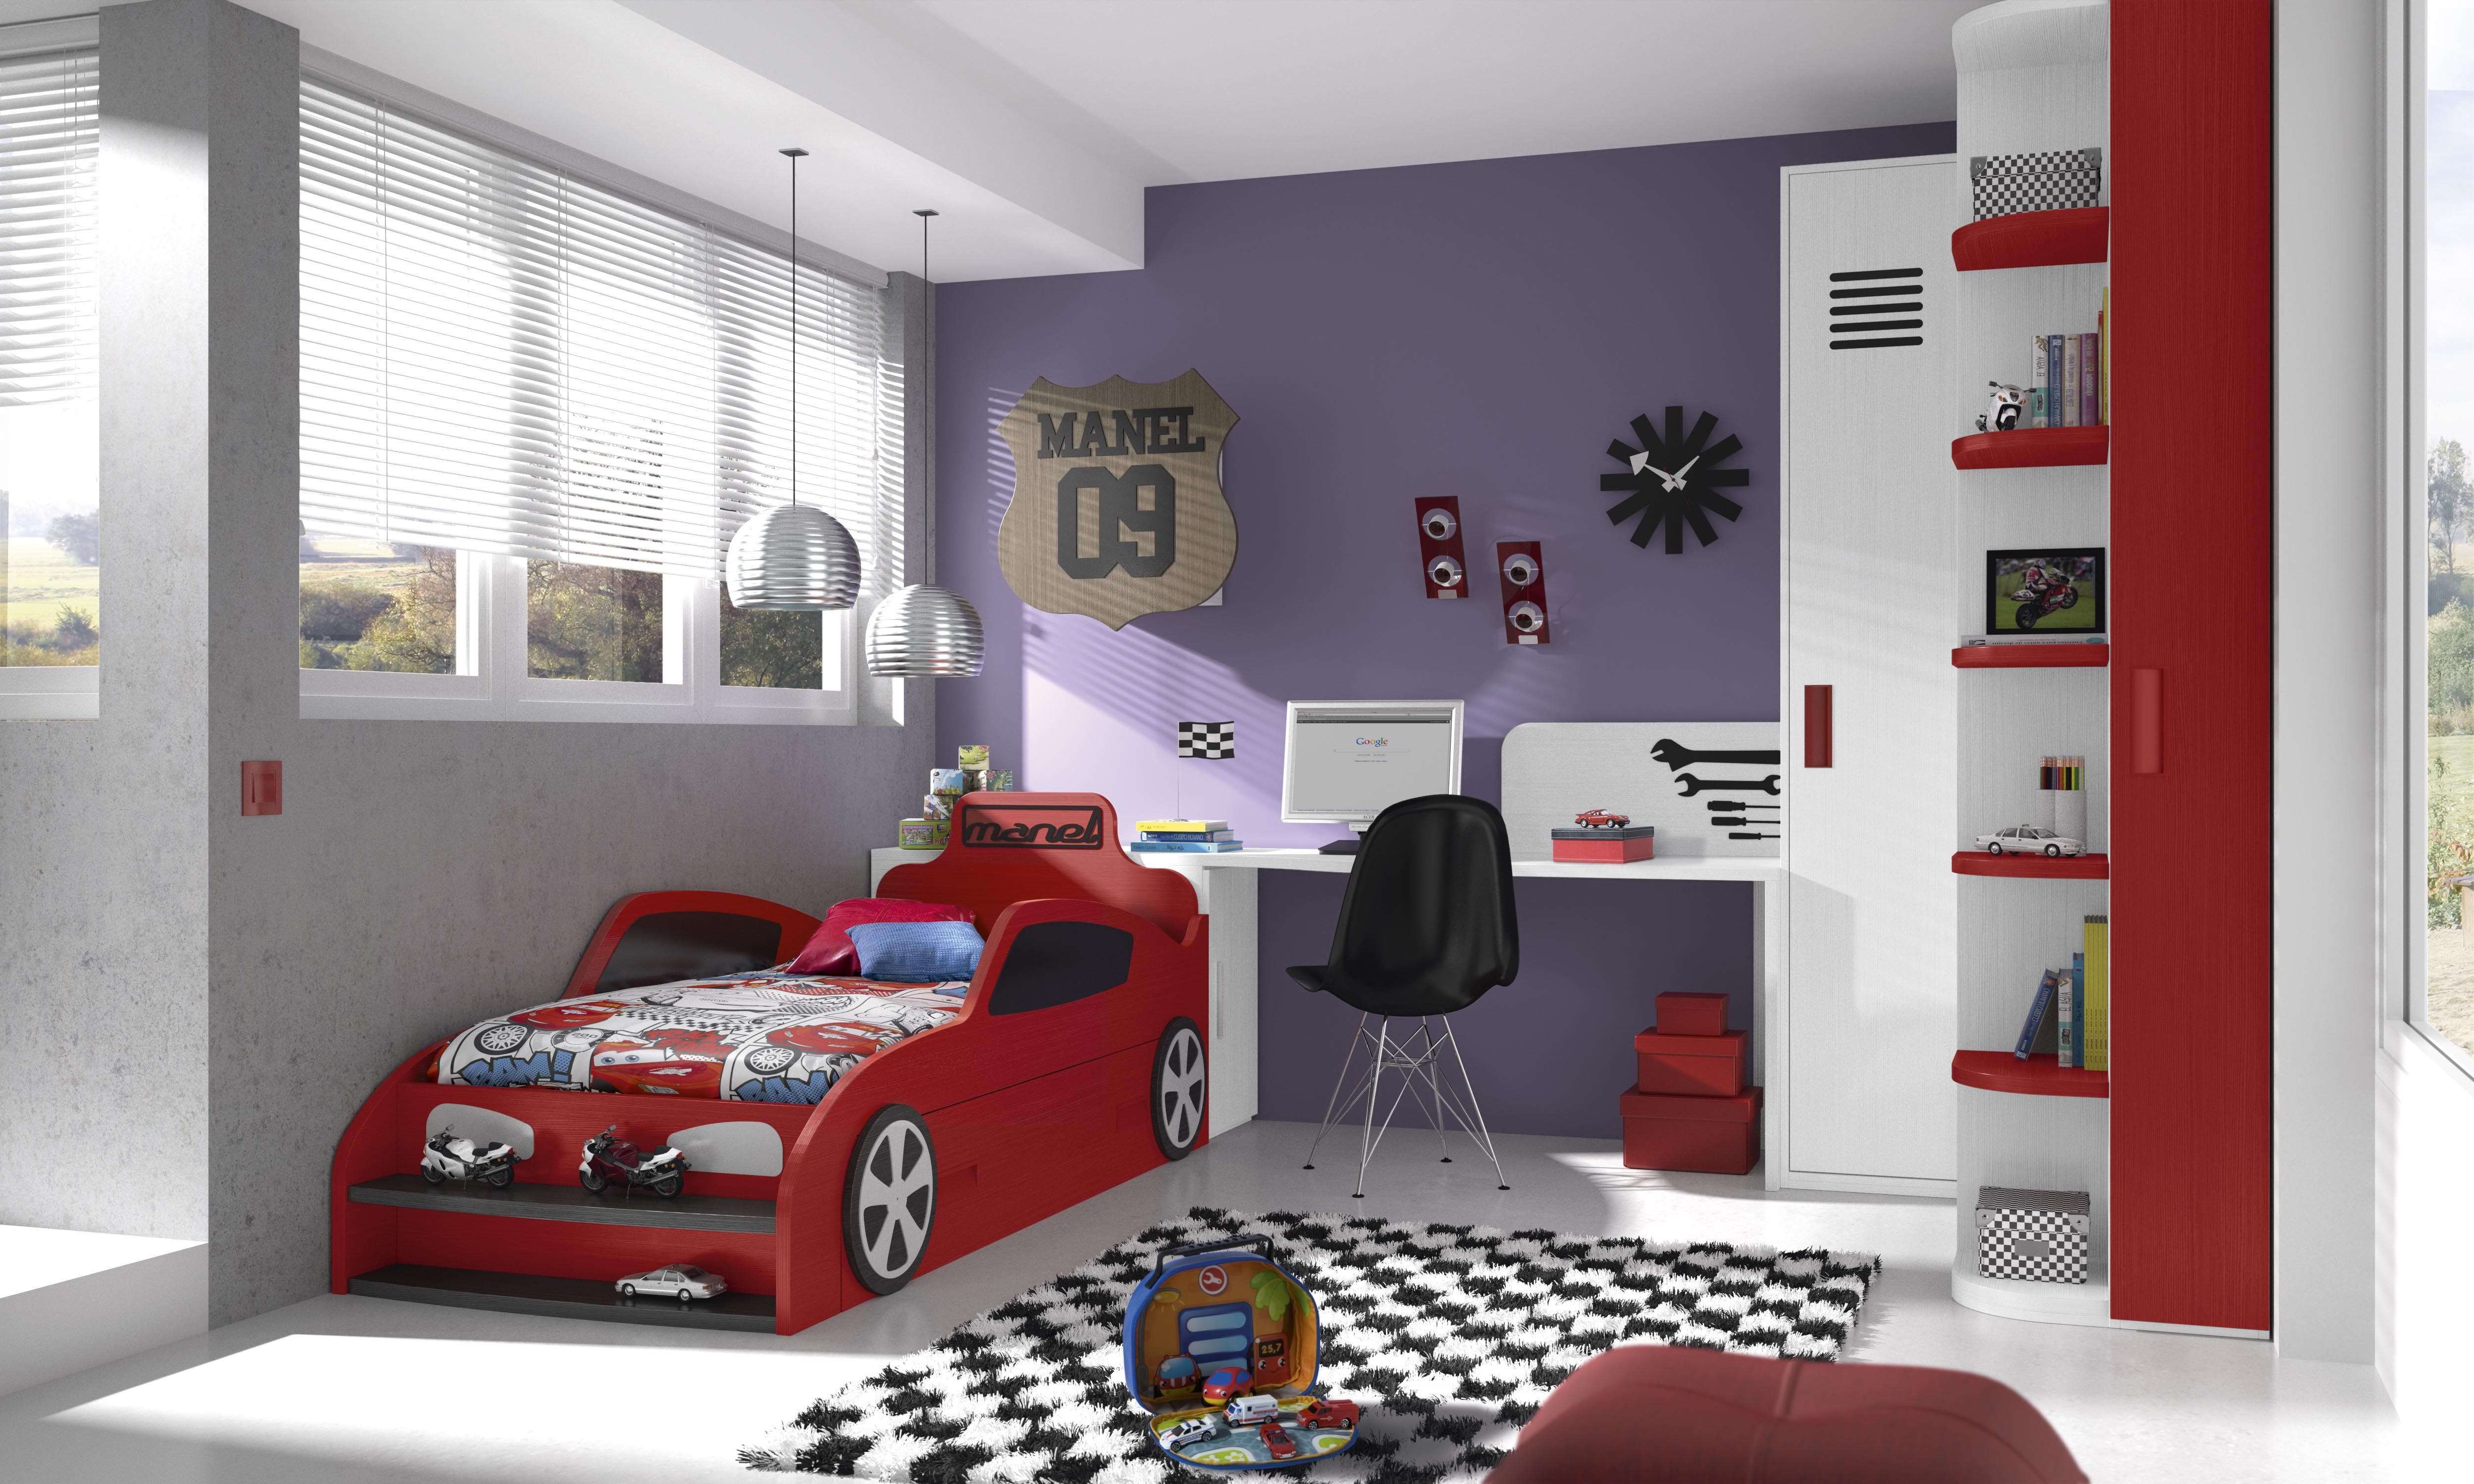 Habitaciones infantiles tem ticas dibujos animados coches2 - Ver habitaciones infantiles ...